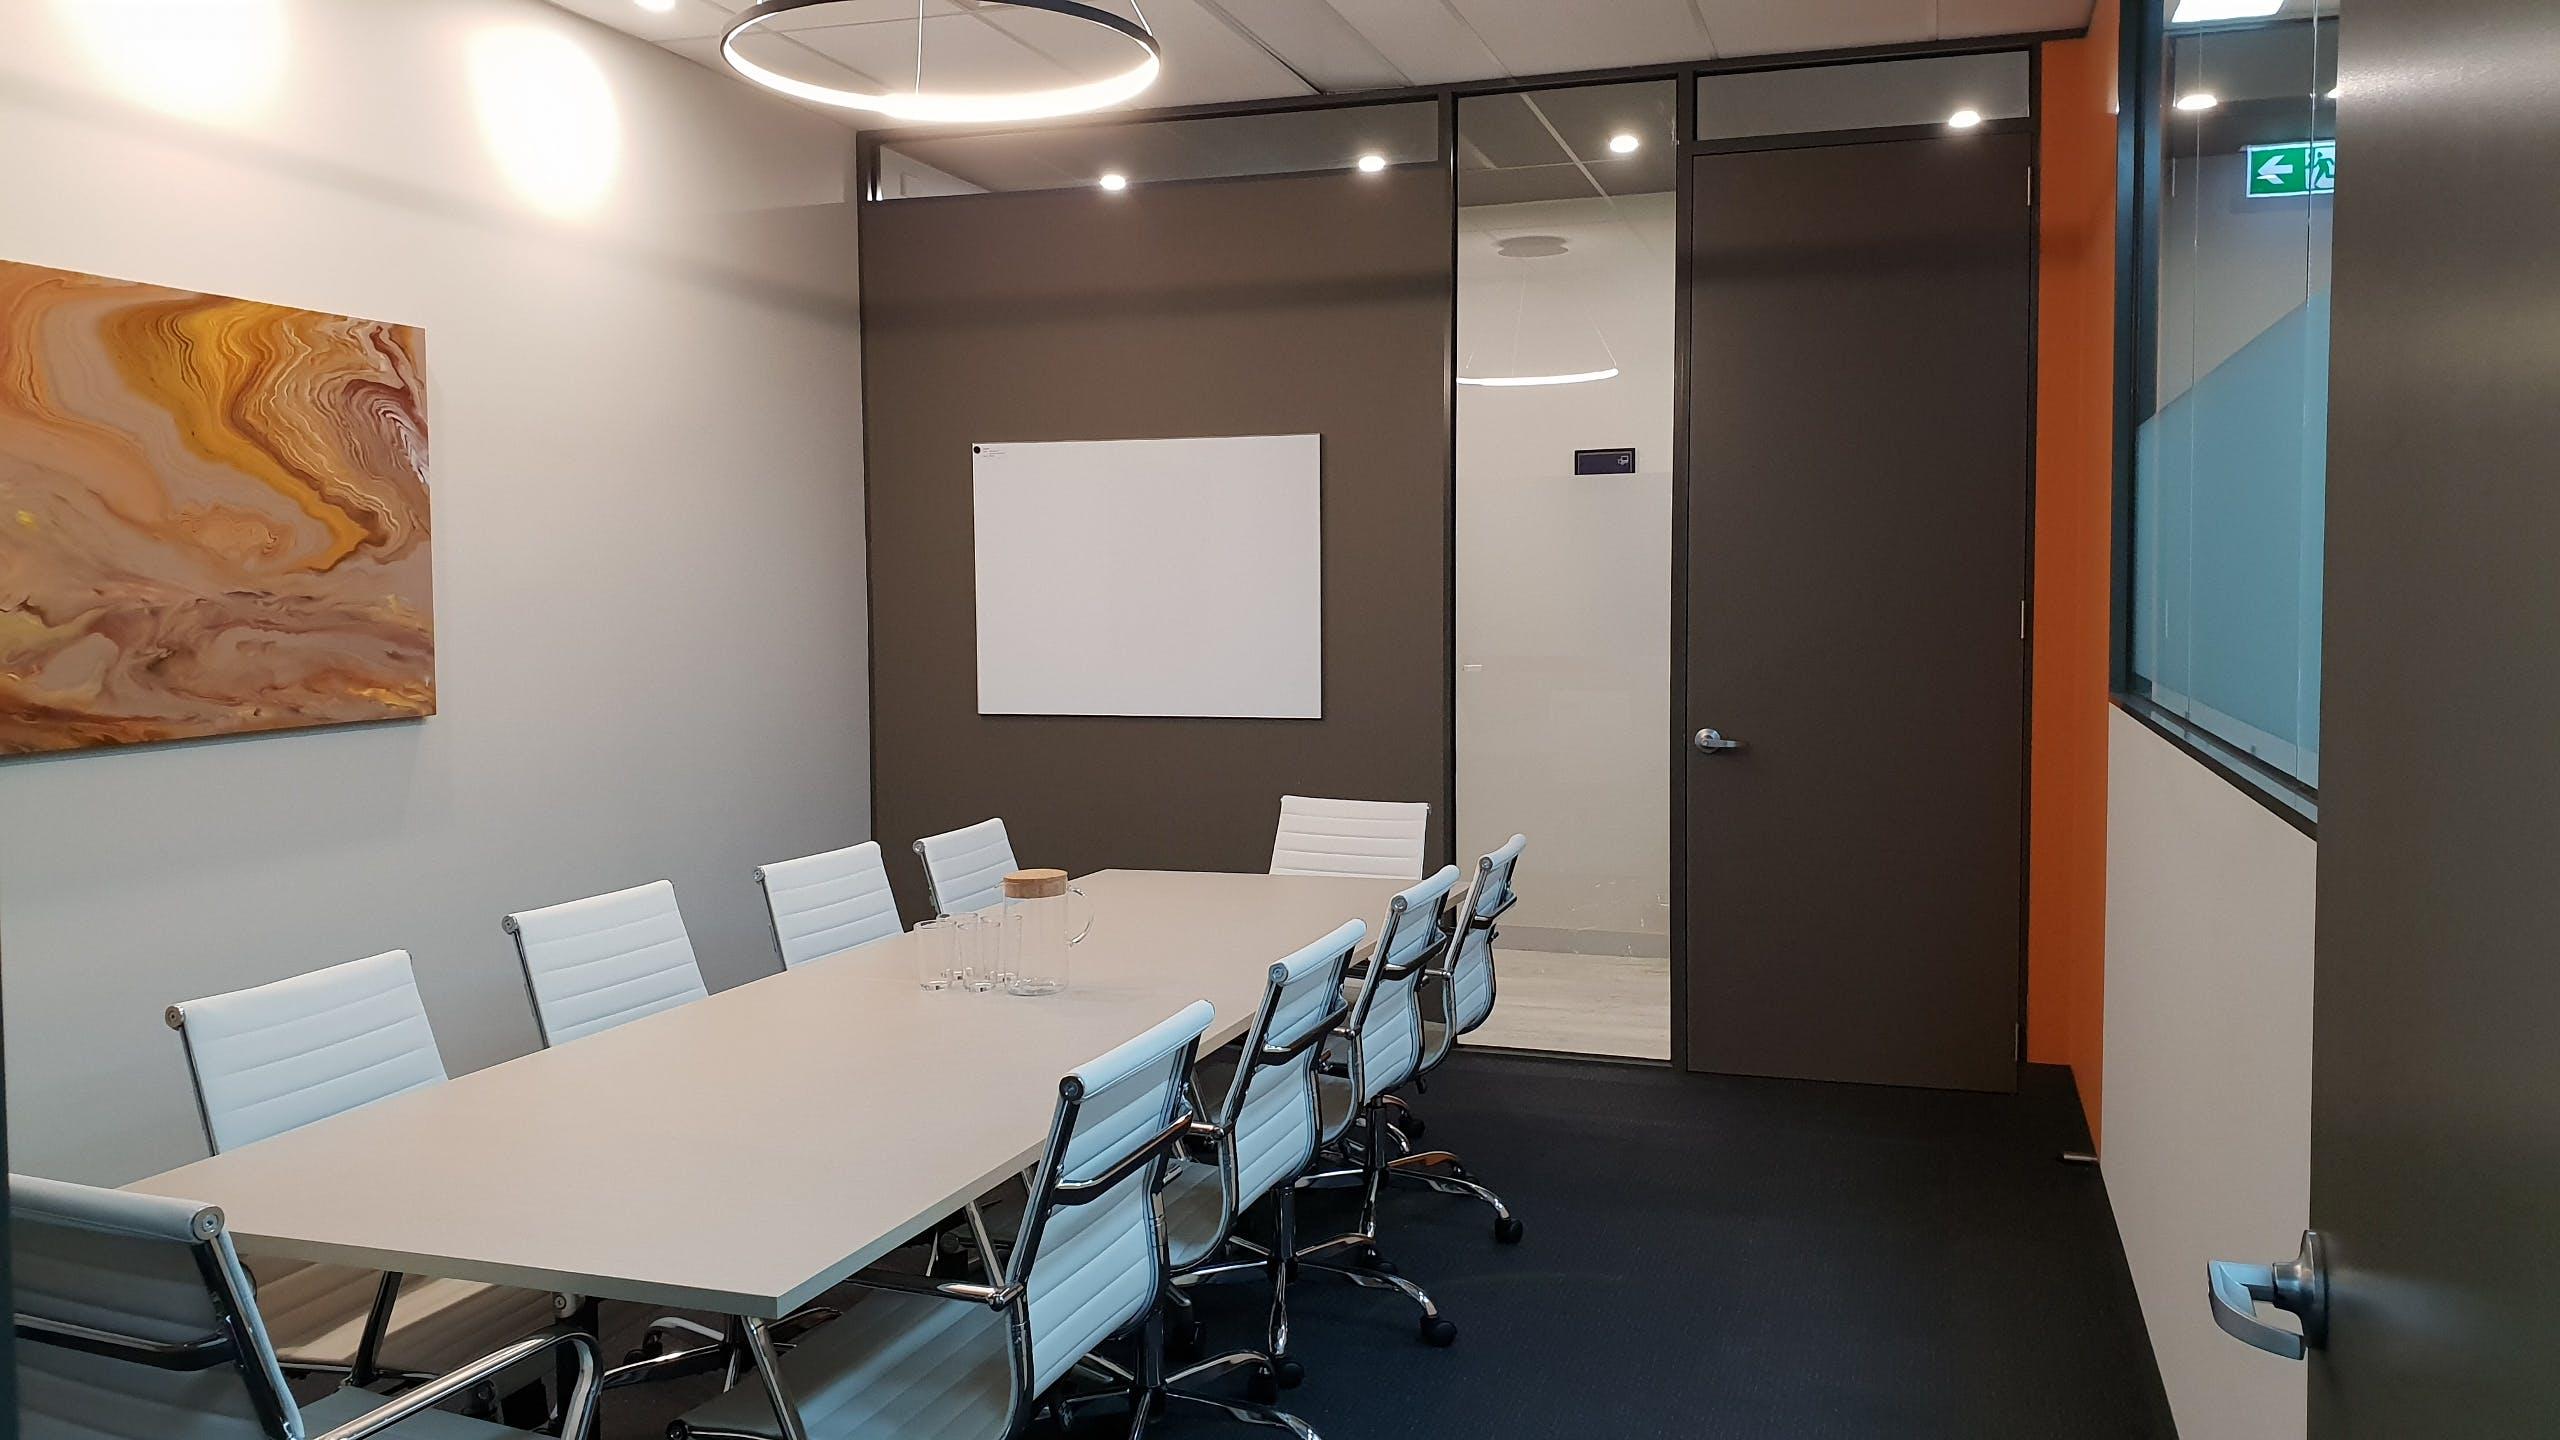 Boardroom, meeting room at 296 Bay Road, image 2